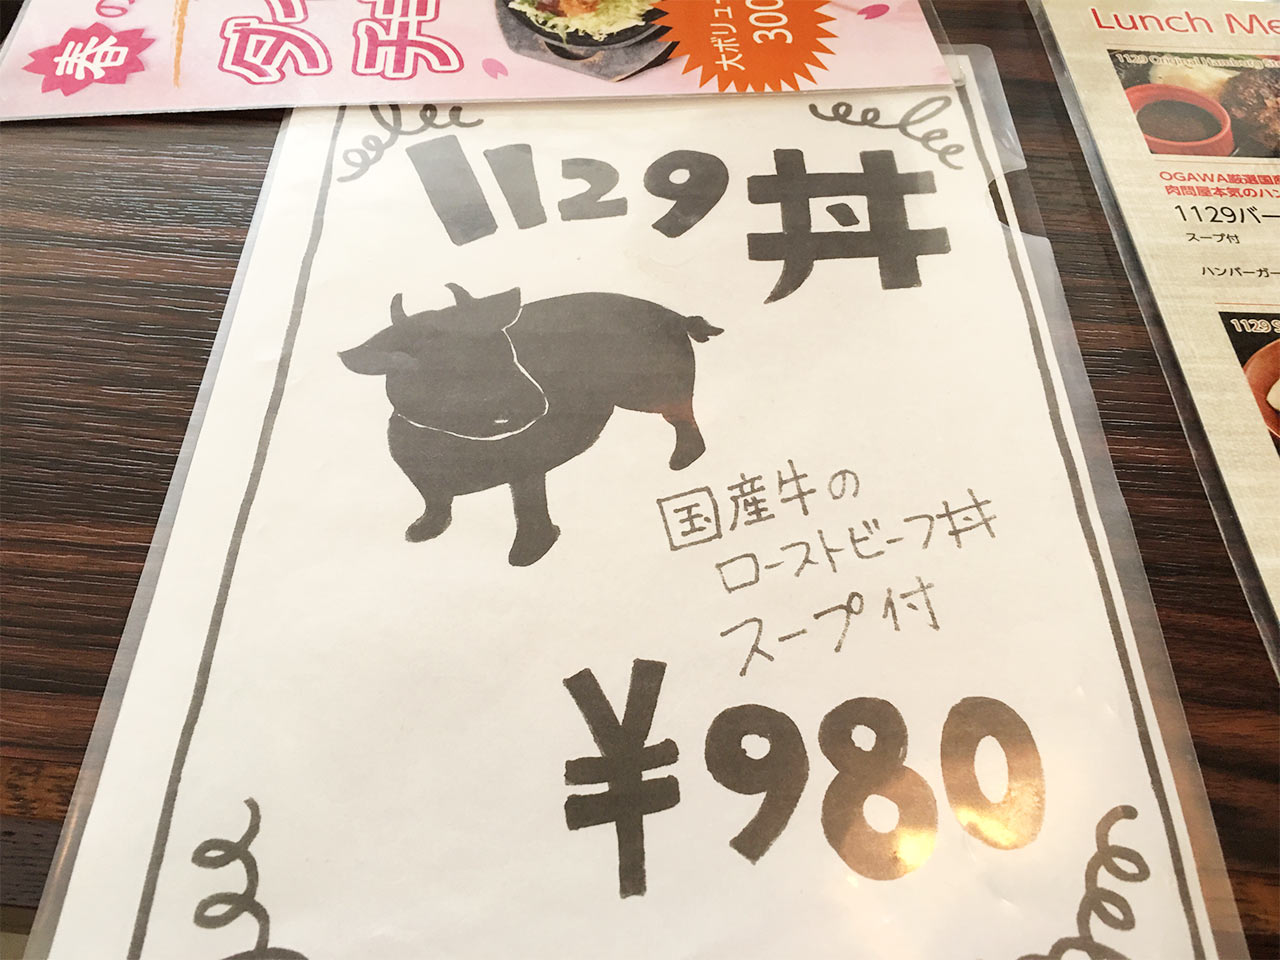 odaiba-1129-menu03